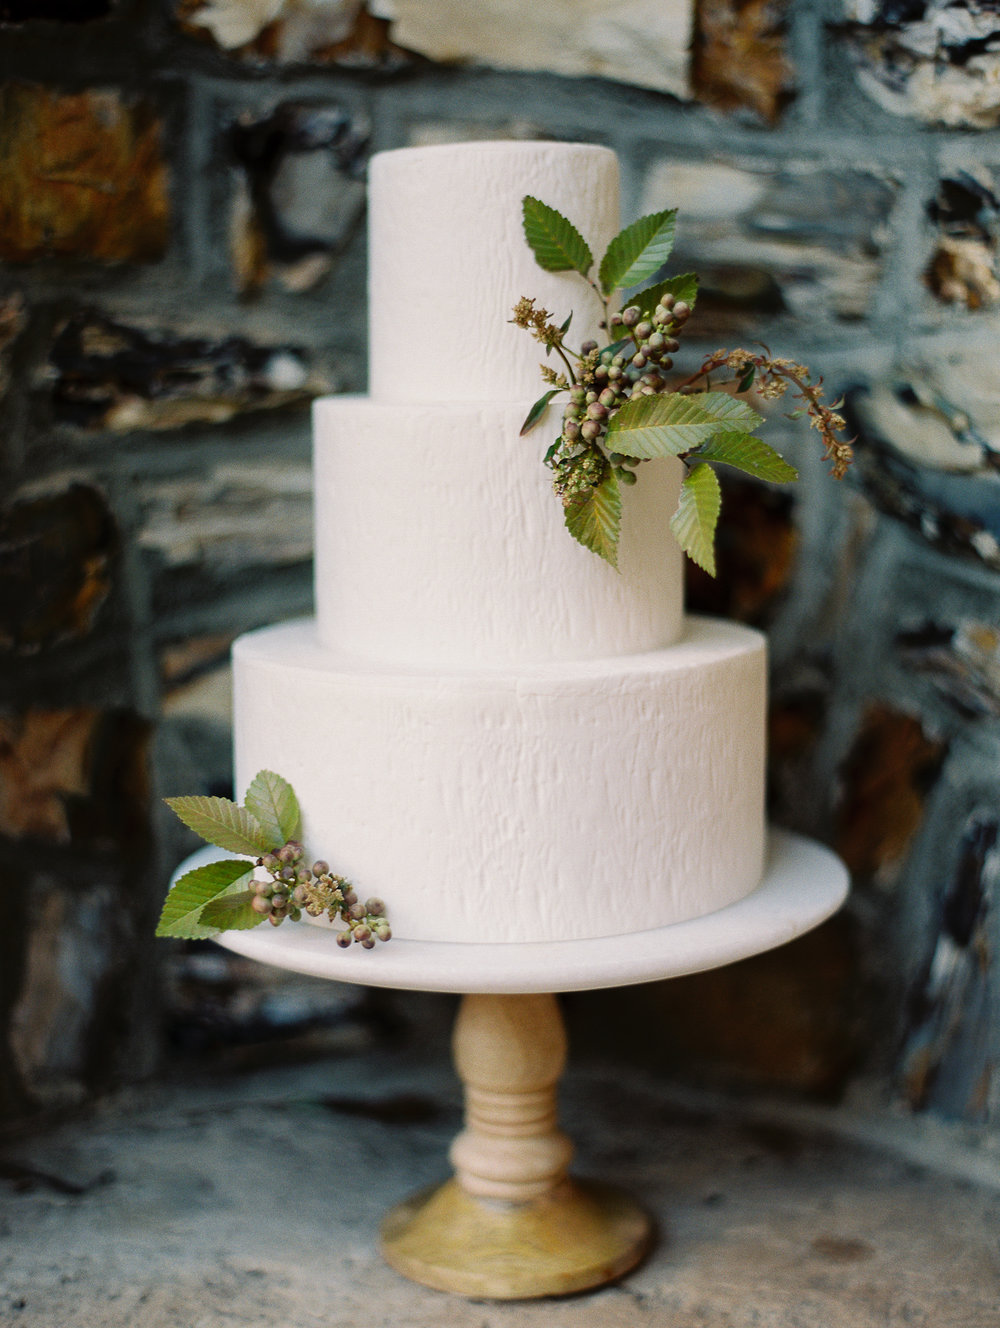 White textured cake with greenery